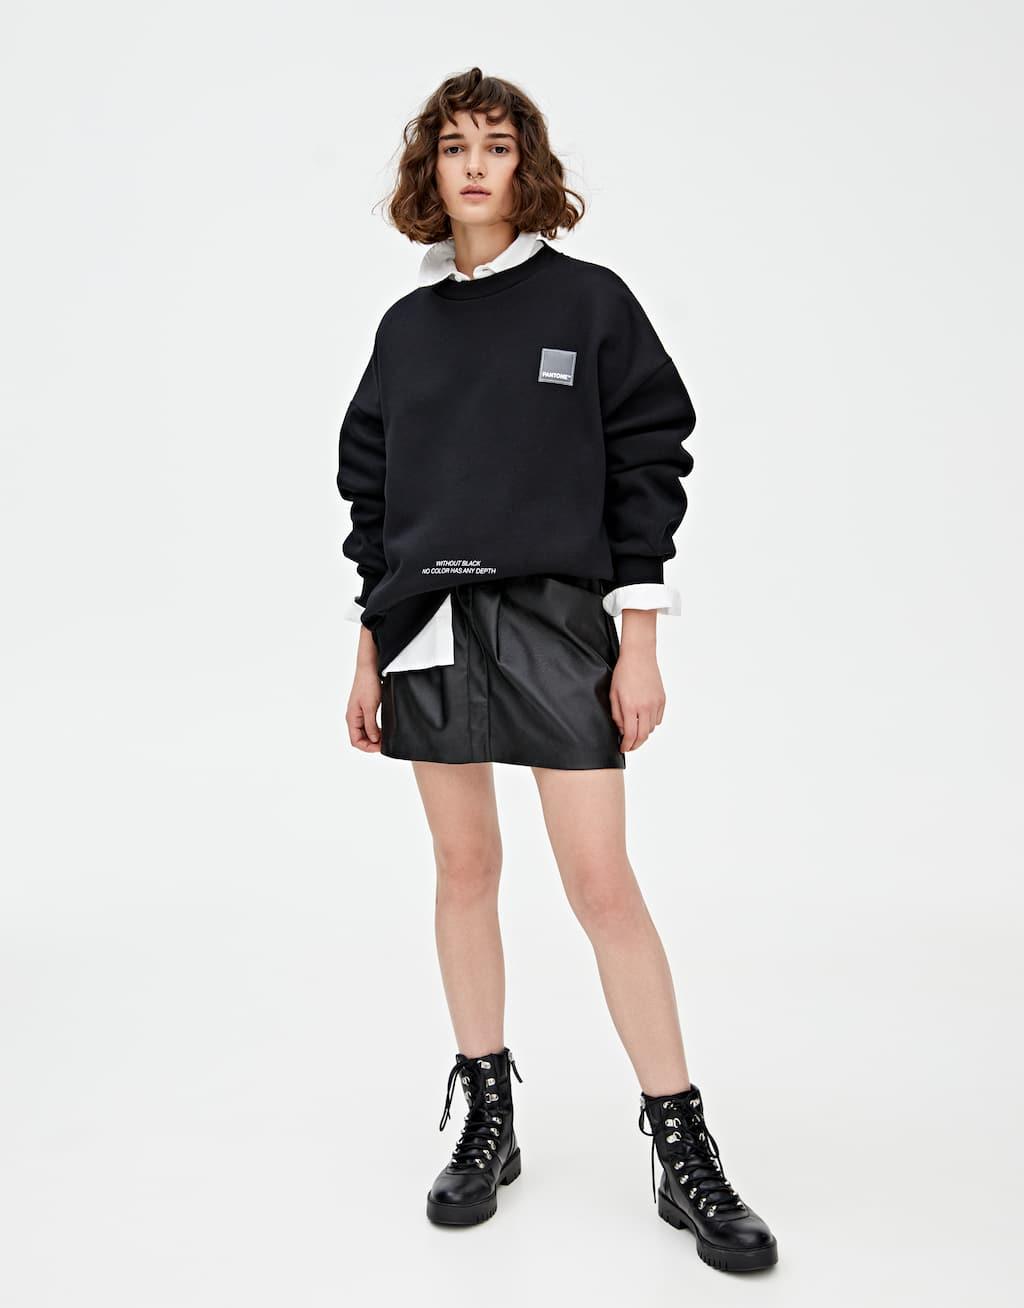 Basic Black Pantone Sweatshirt by Pull & Bear